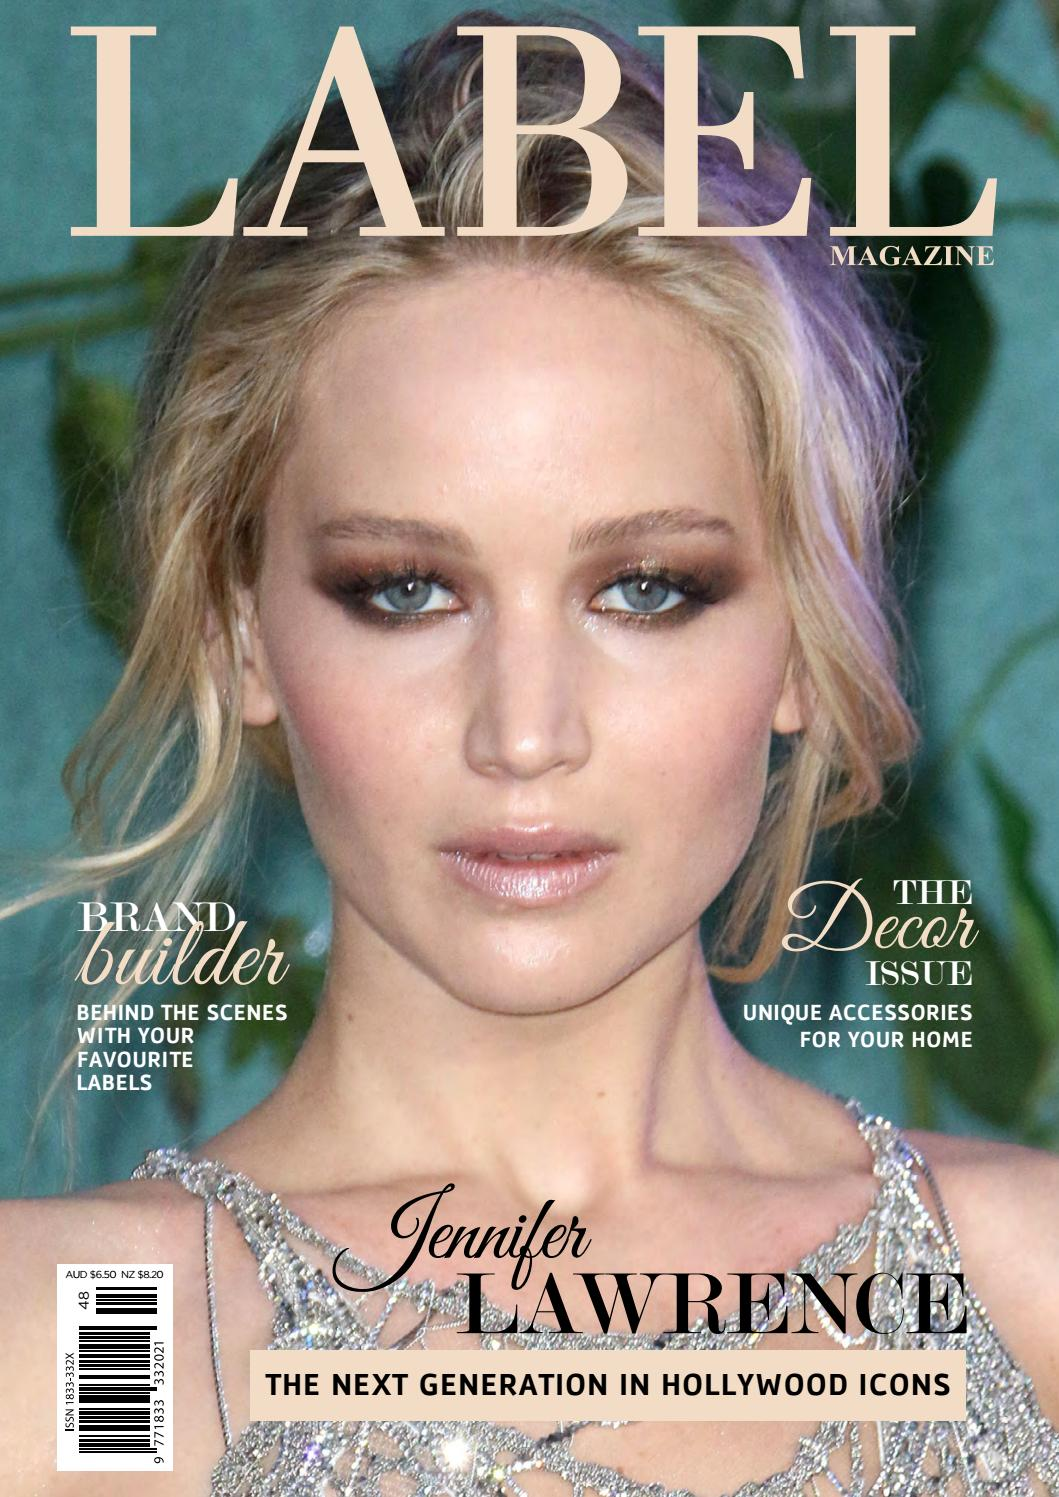 Label Magazine Summer 2017 by Label Magazine - issuu